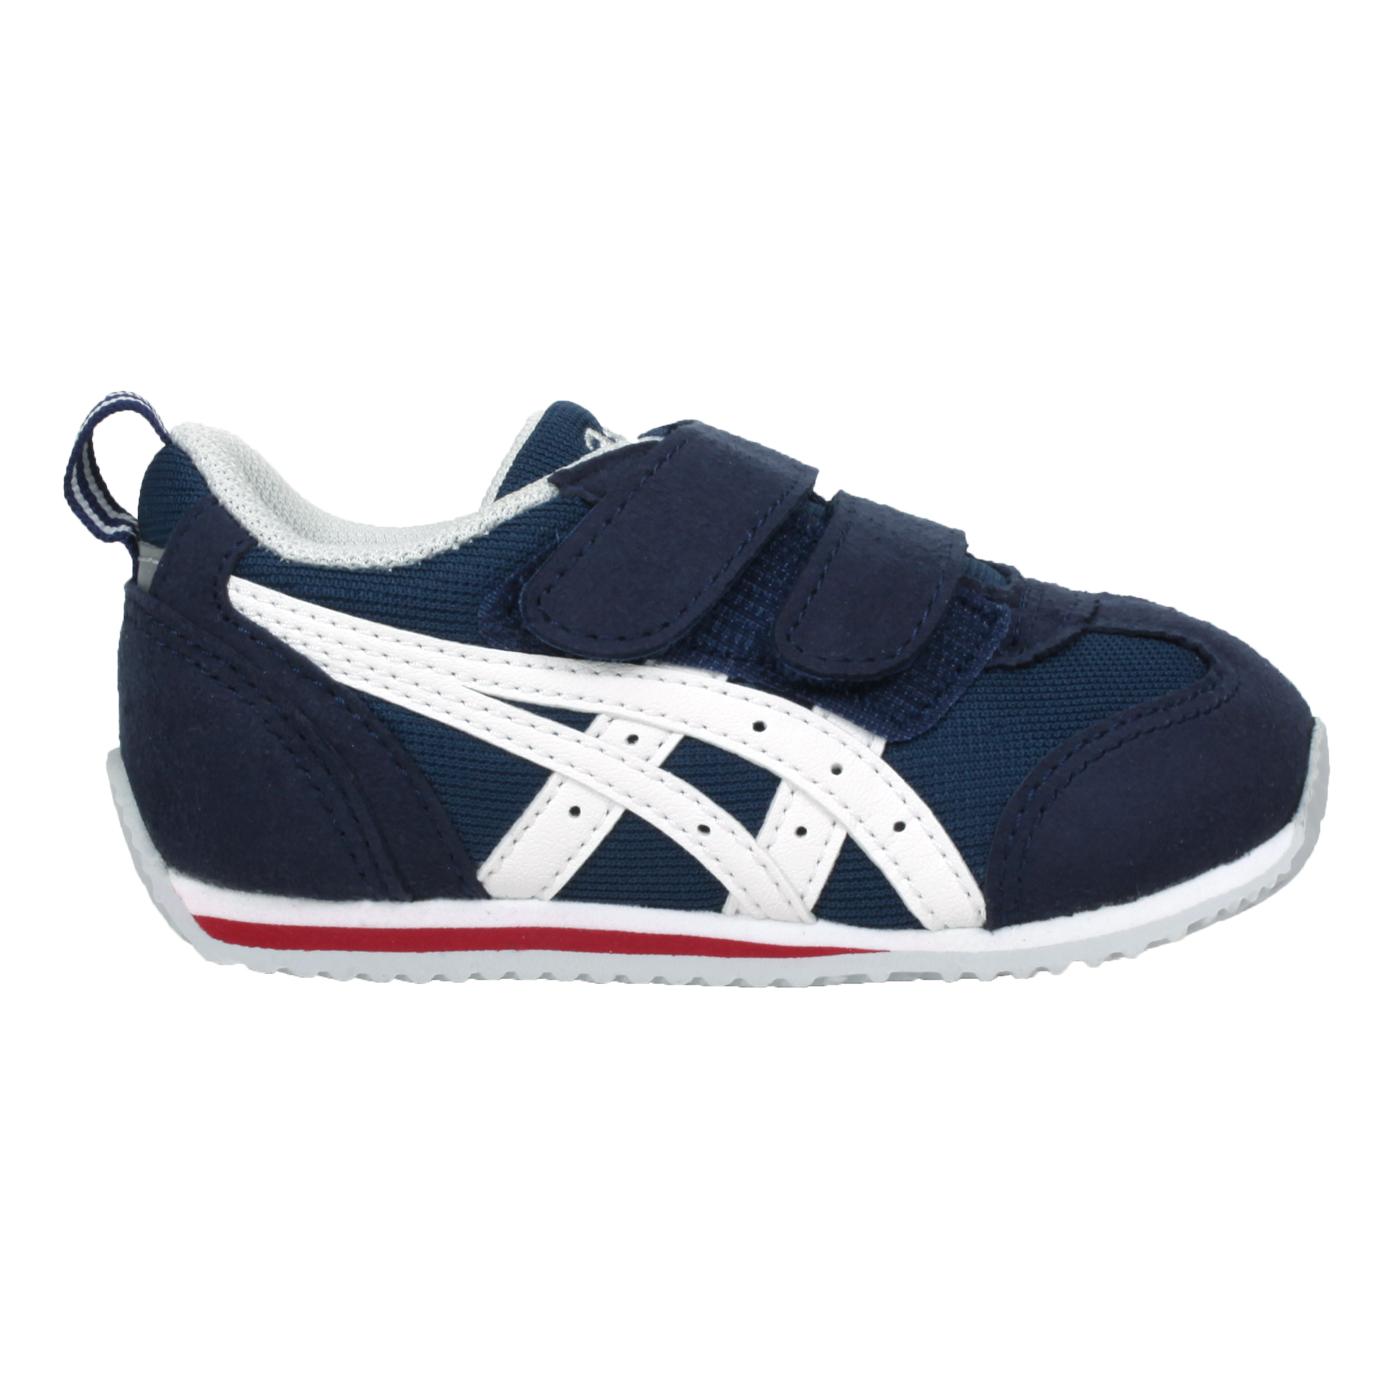 ASICS 小童運動鞋  @IDAHO BABY JP@TUB164-5001